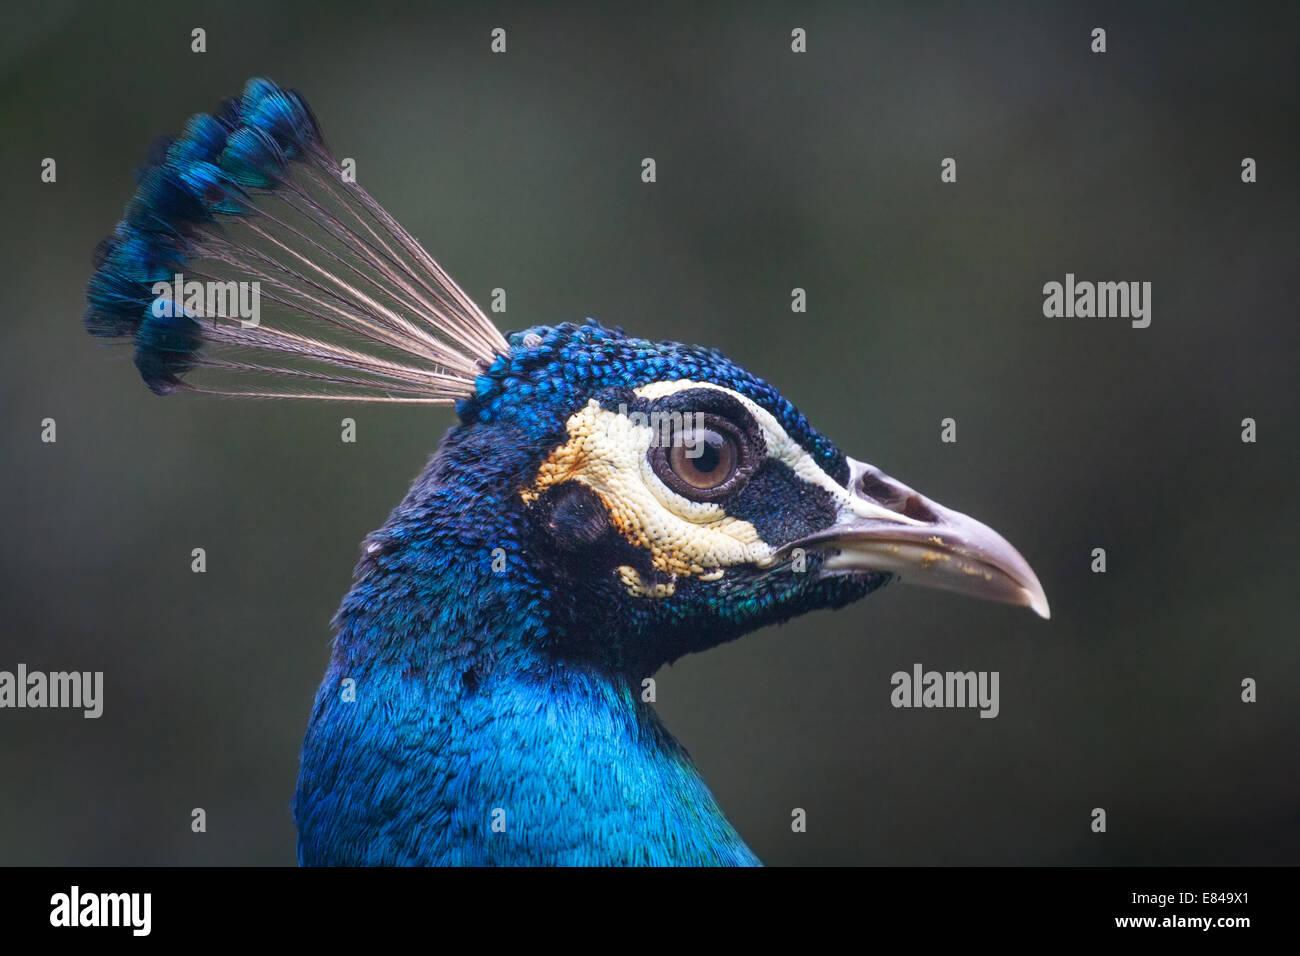 Portrait of a male Peafowl - Stock Image